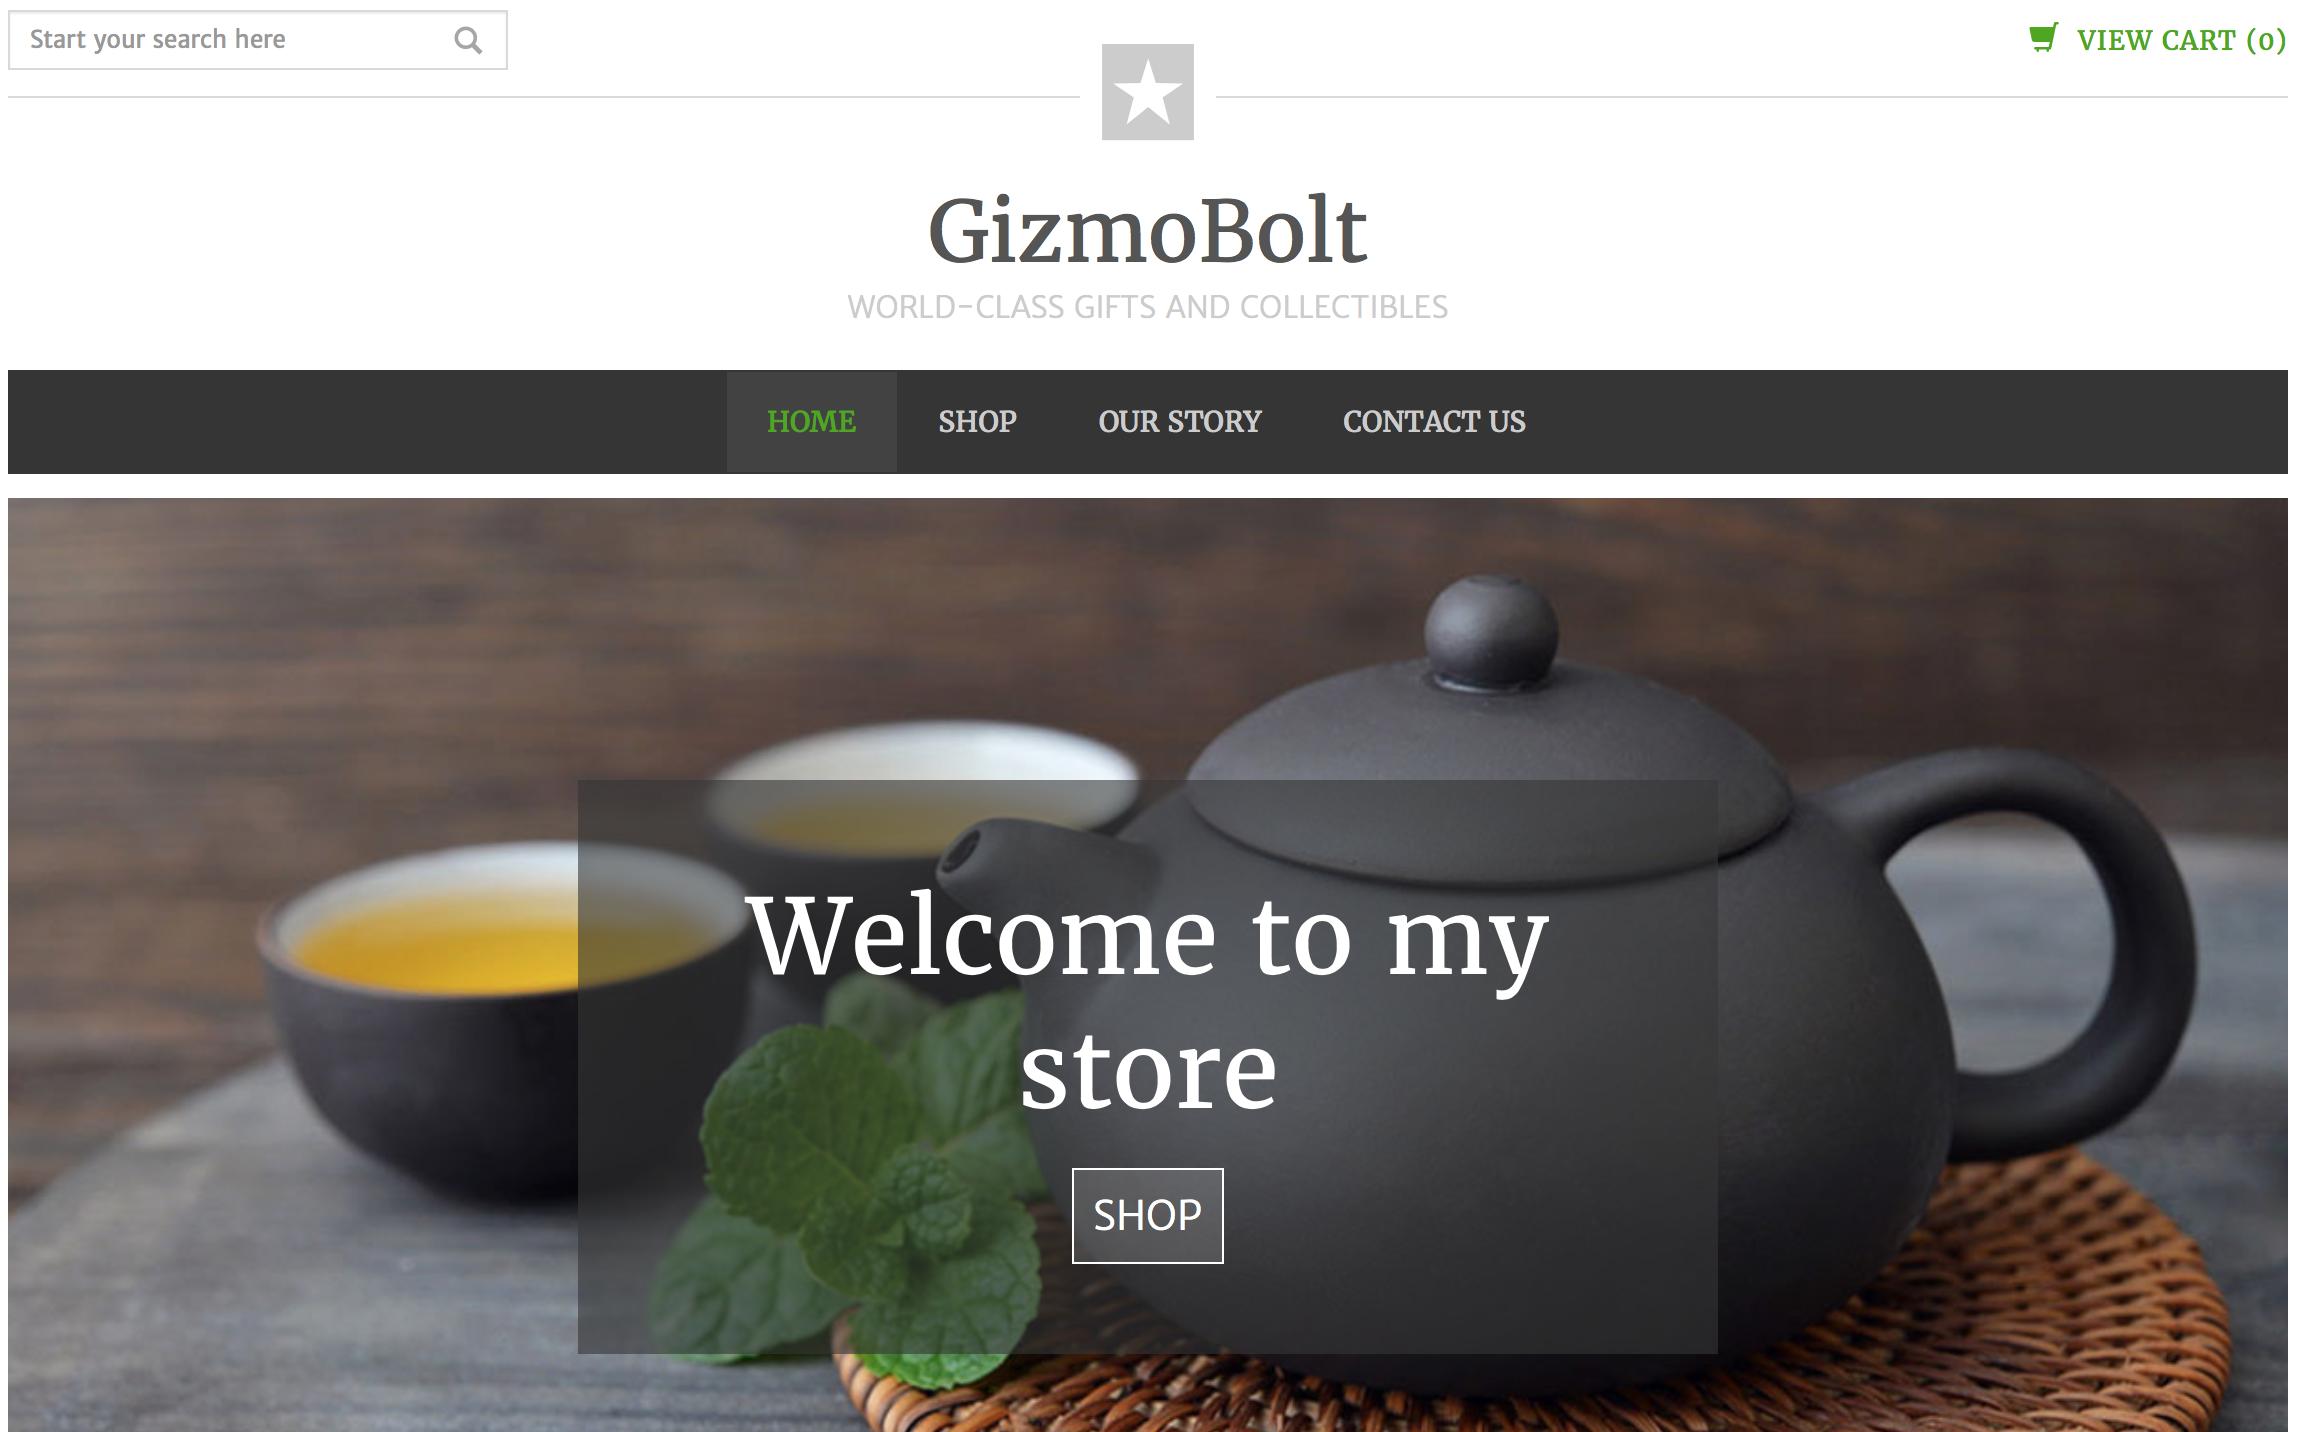 GizmoBolt GoDaddy Online Store